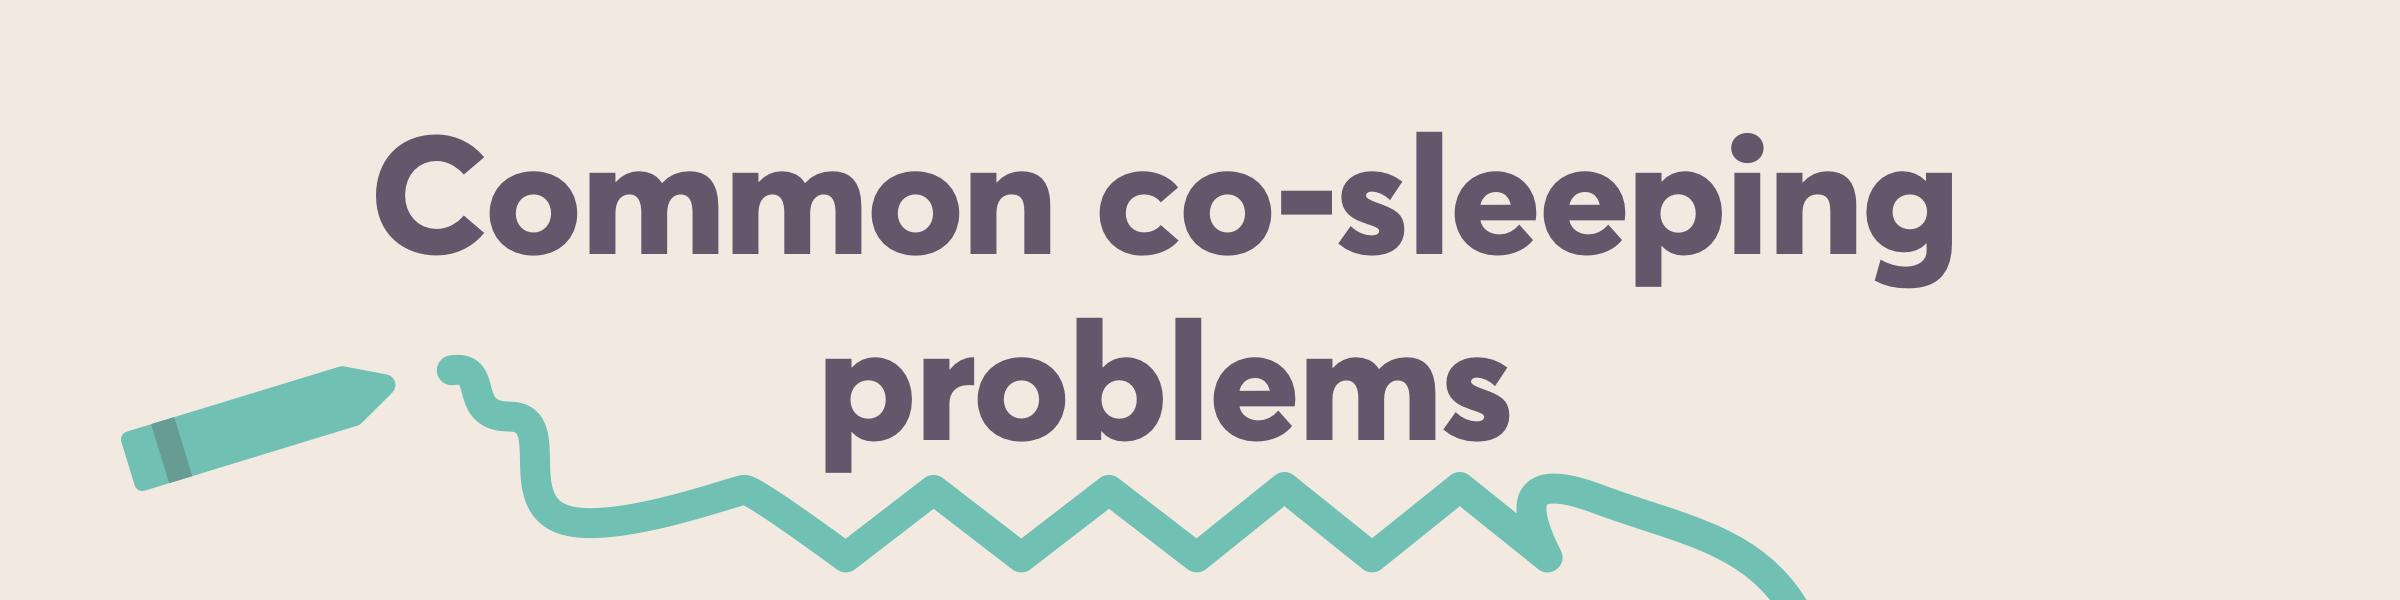 sleep and relationships: common co-sleeping problems